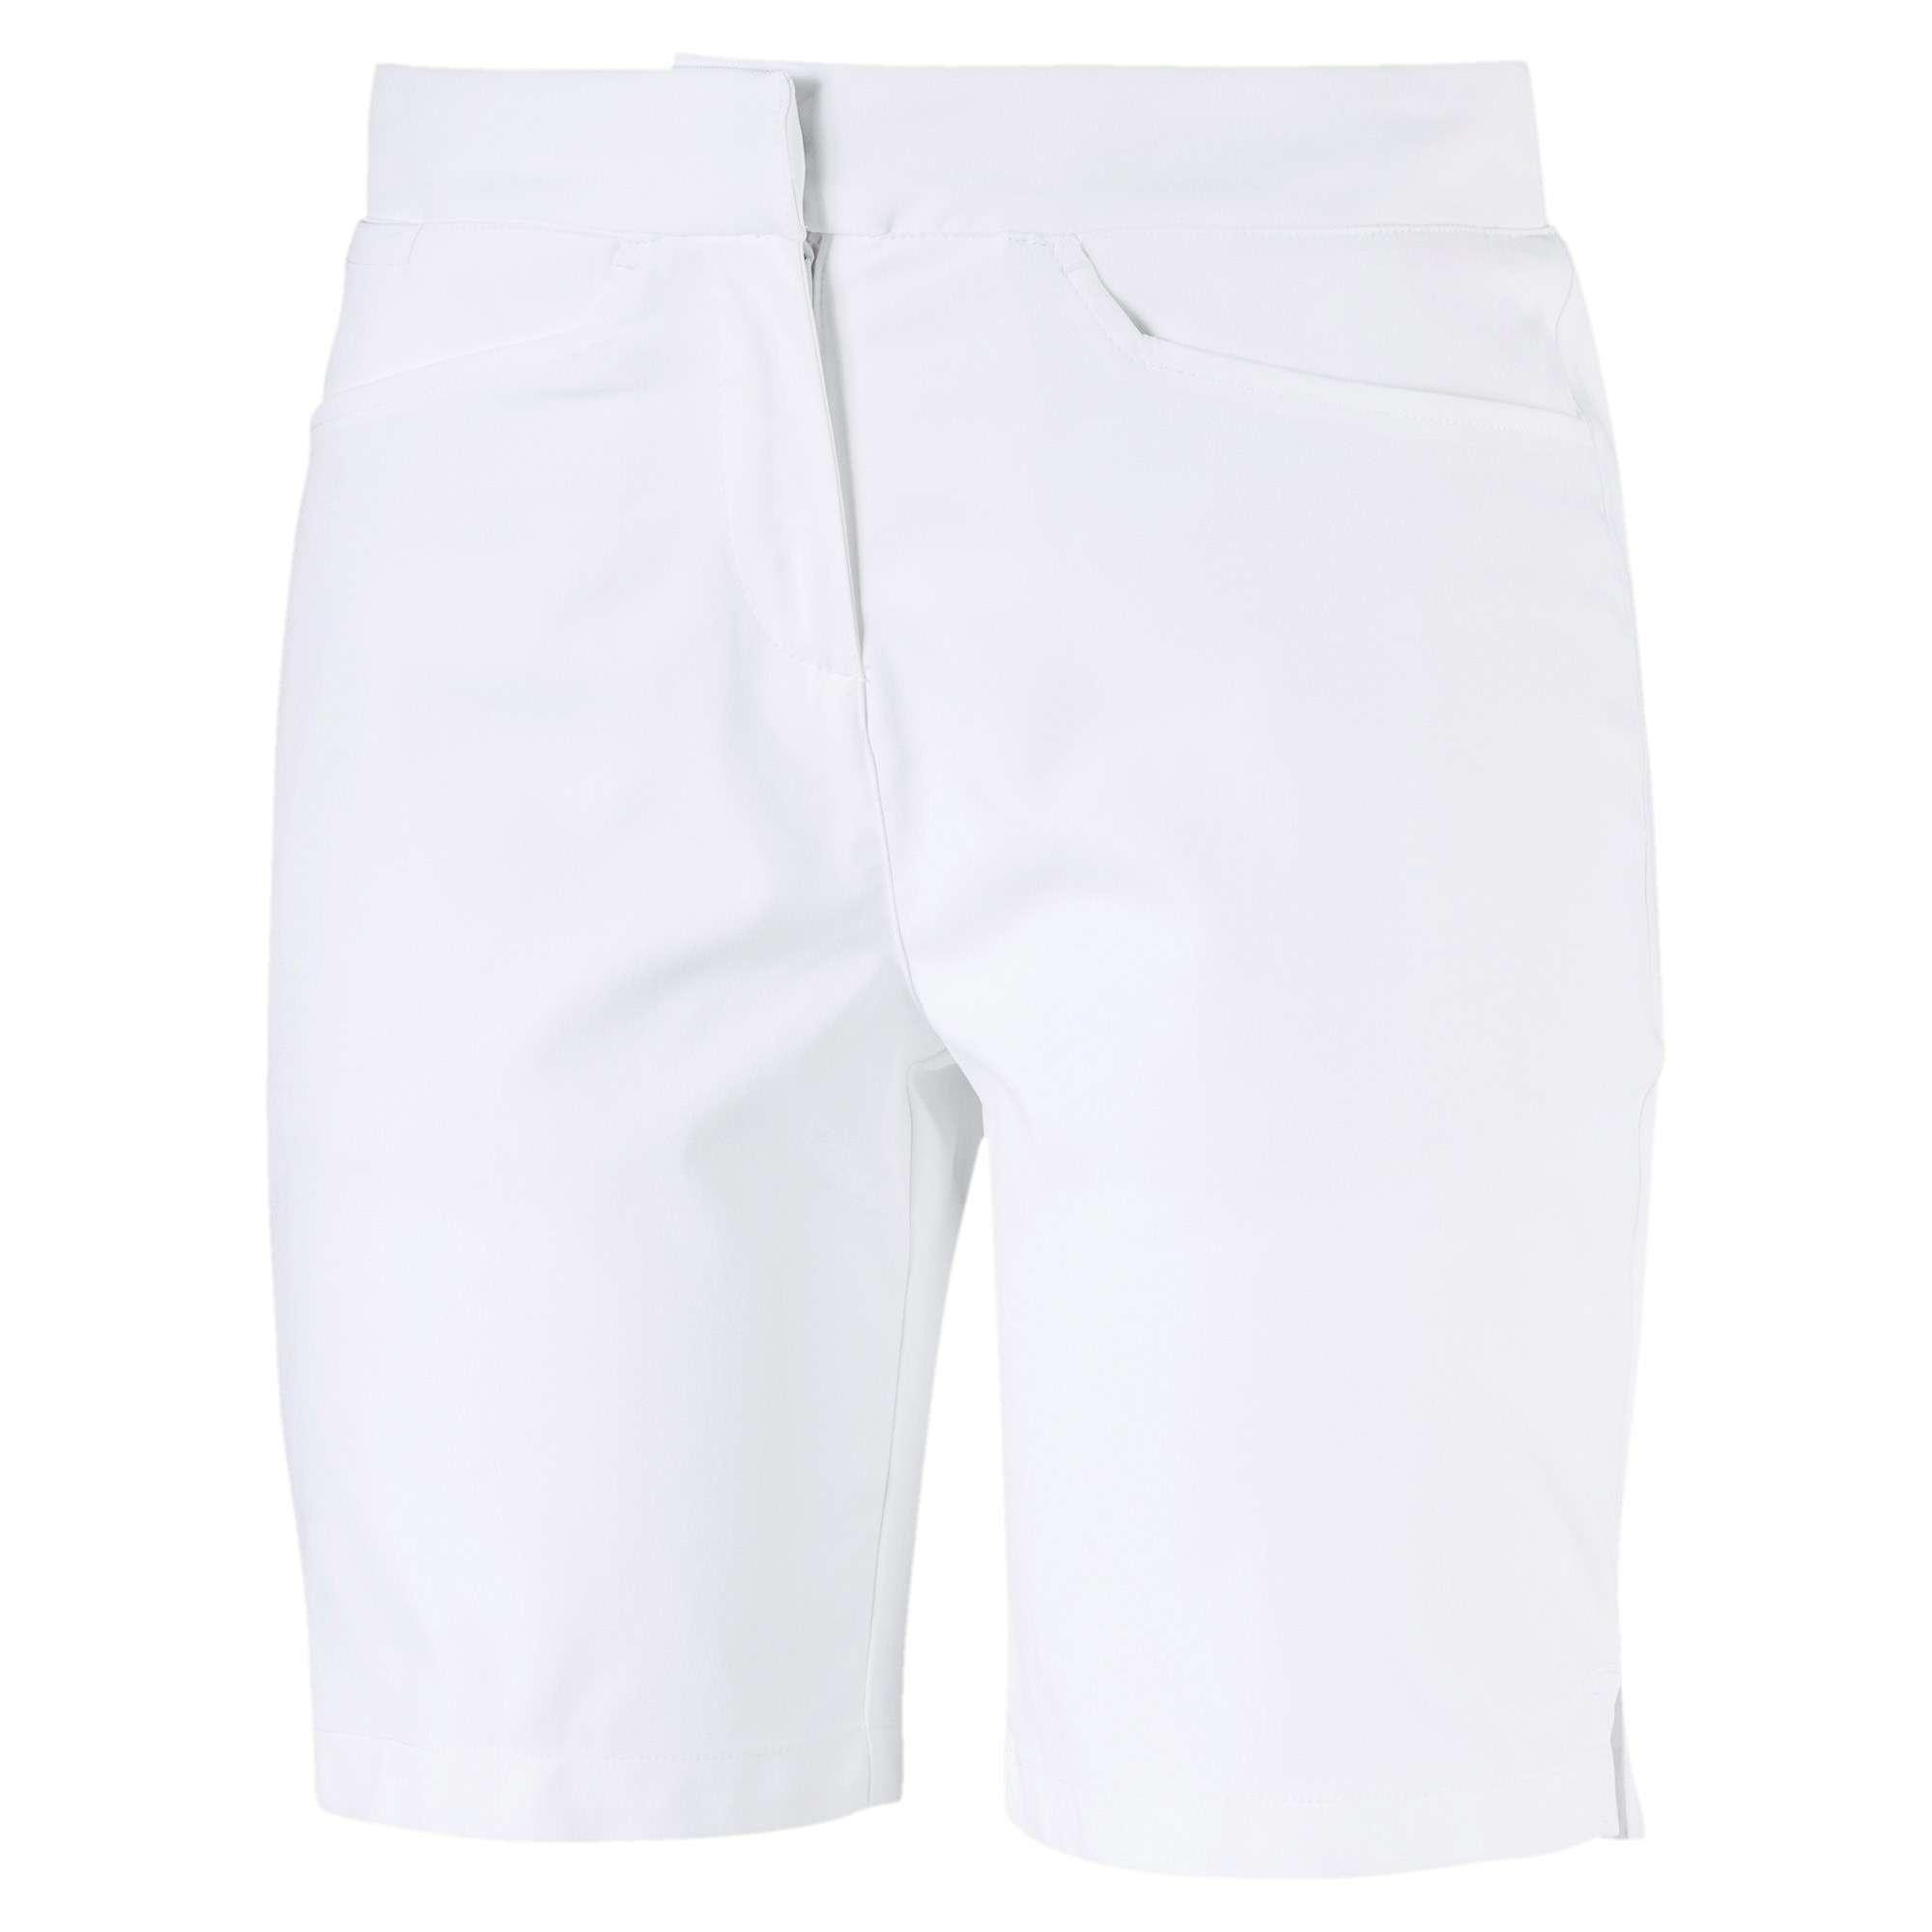 Puma Pounce Damen Golf Bermuda Shorts, Weiß